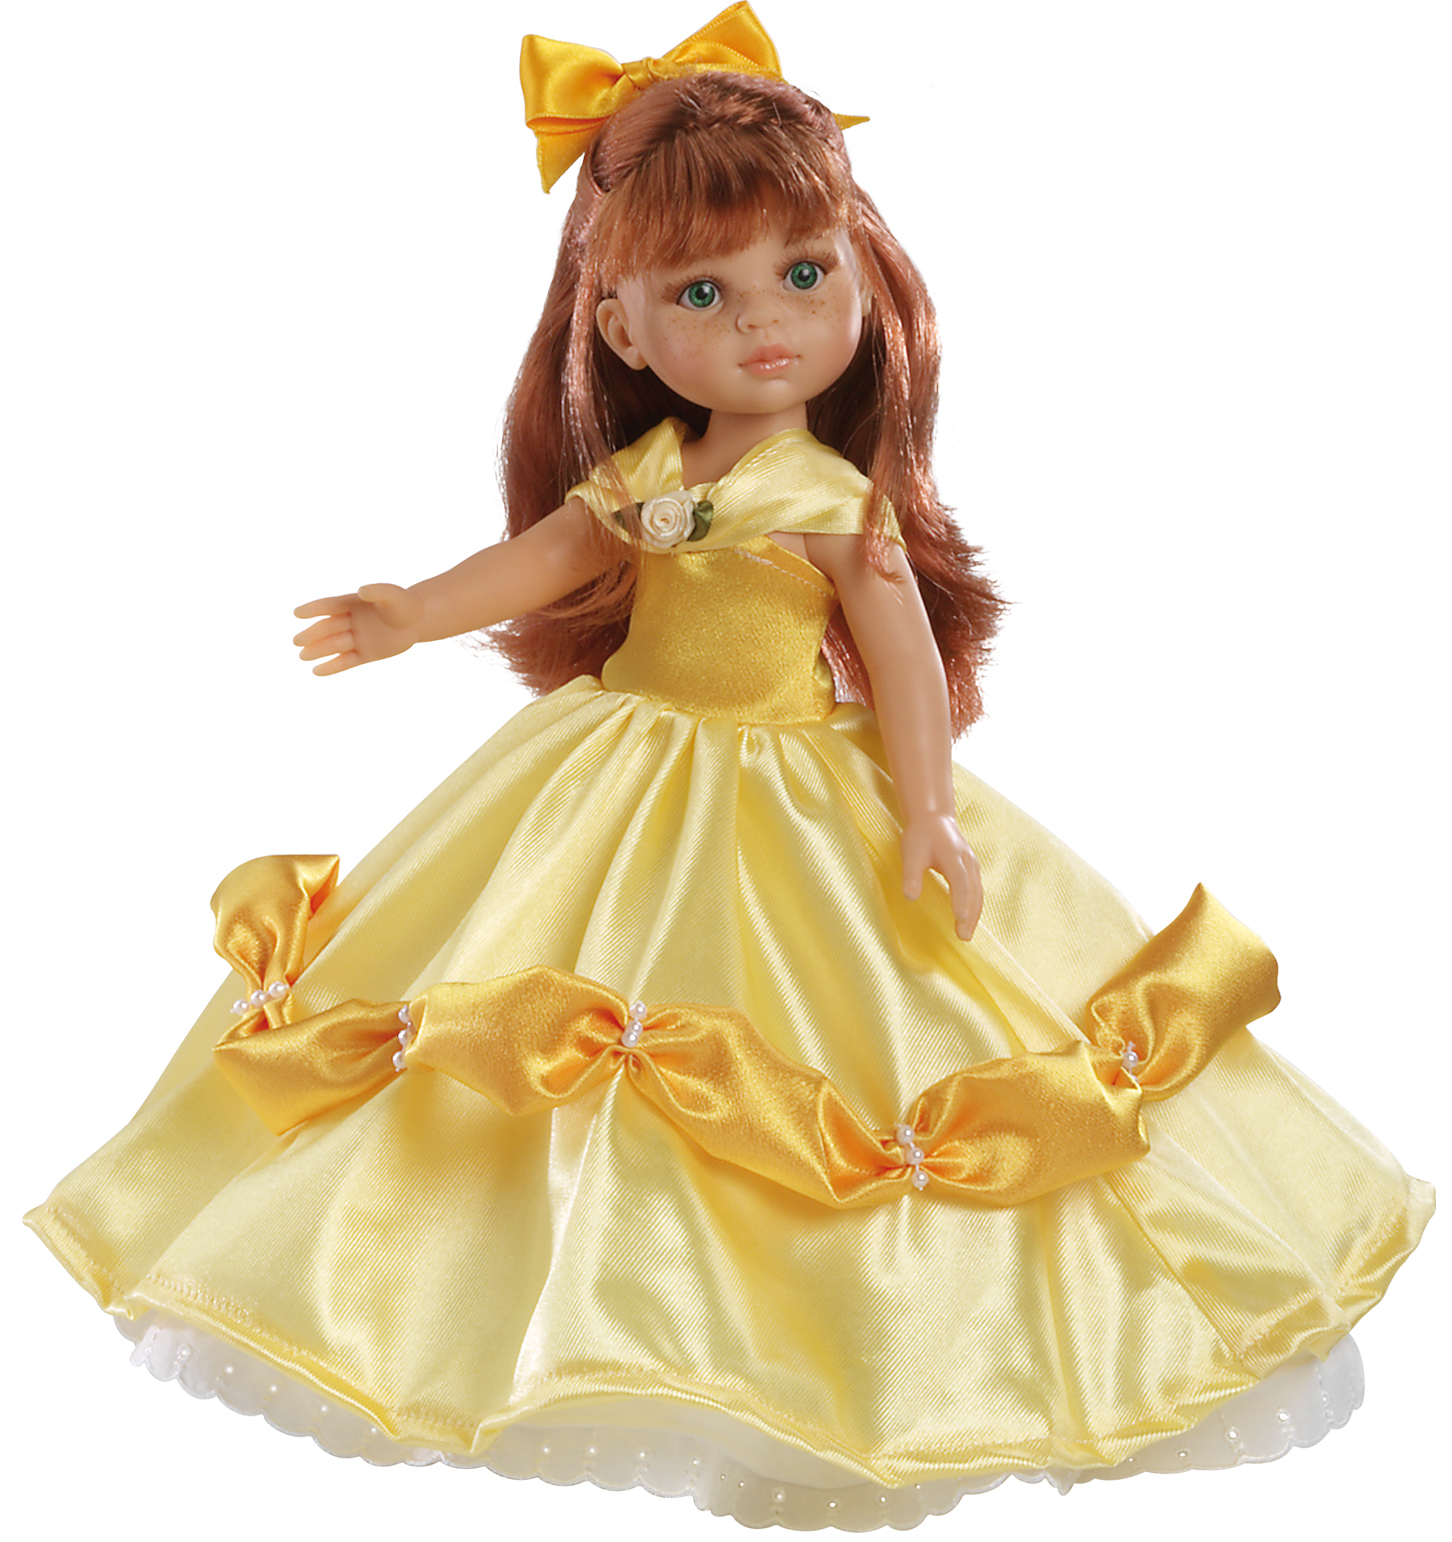 Realistická panenka žlutá princezna od Paola Reina ze Španělska (Doprava zdarma)